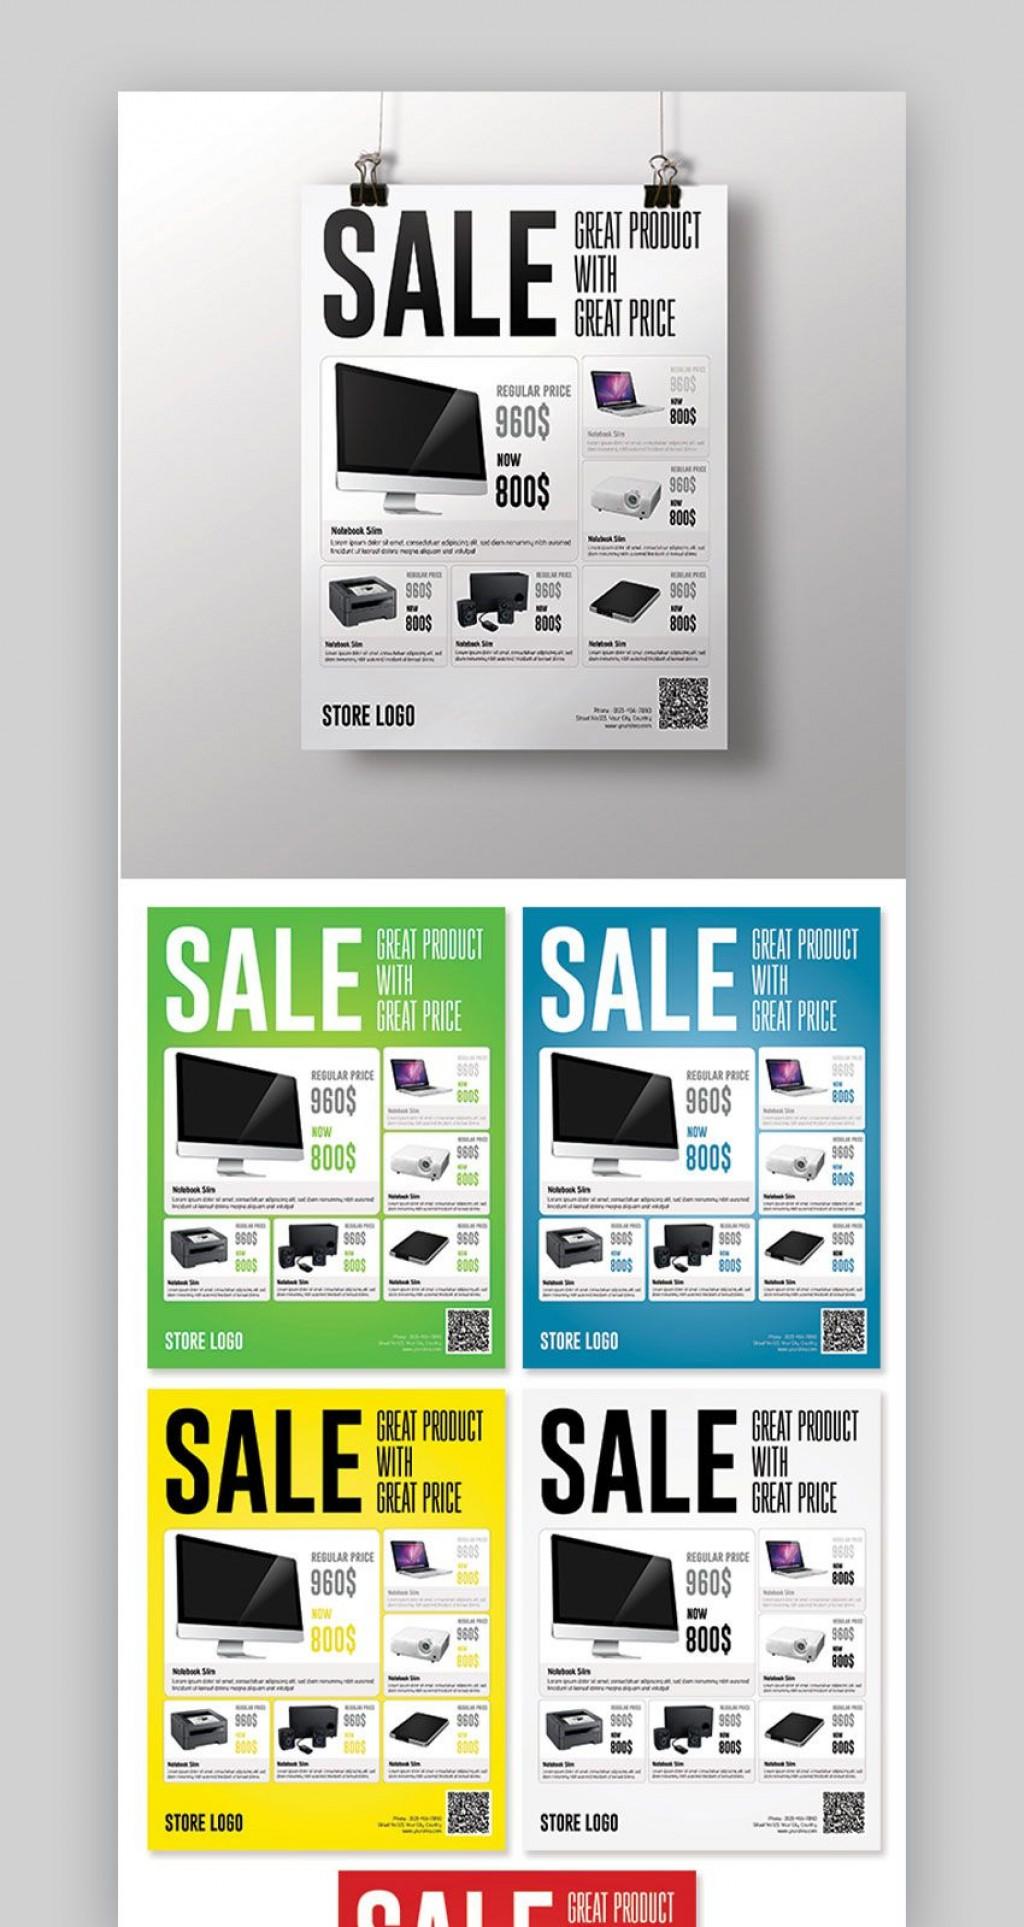 009 Stunning For Sale Flyer Template Idea  Car Ad Microsoft Word HouseLarge